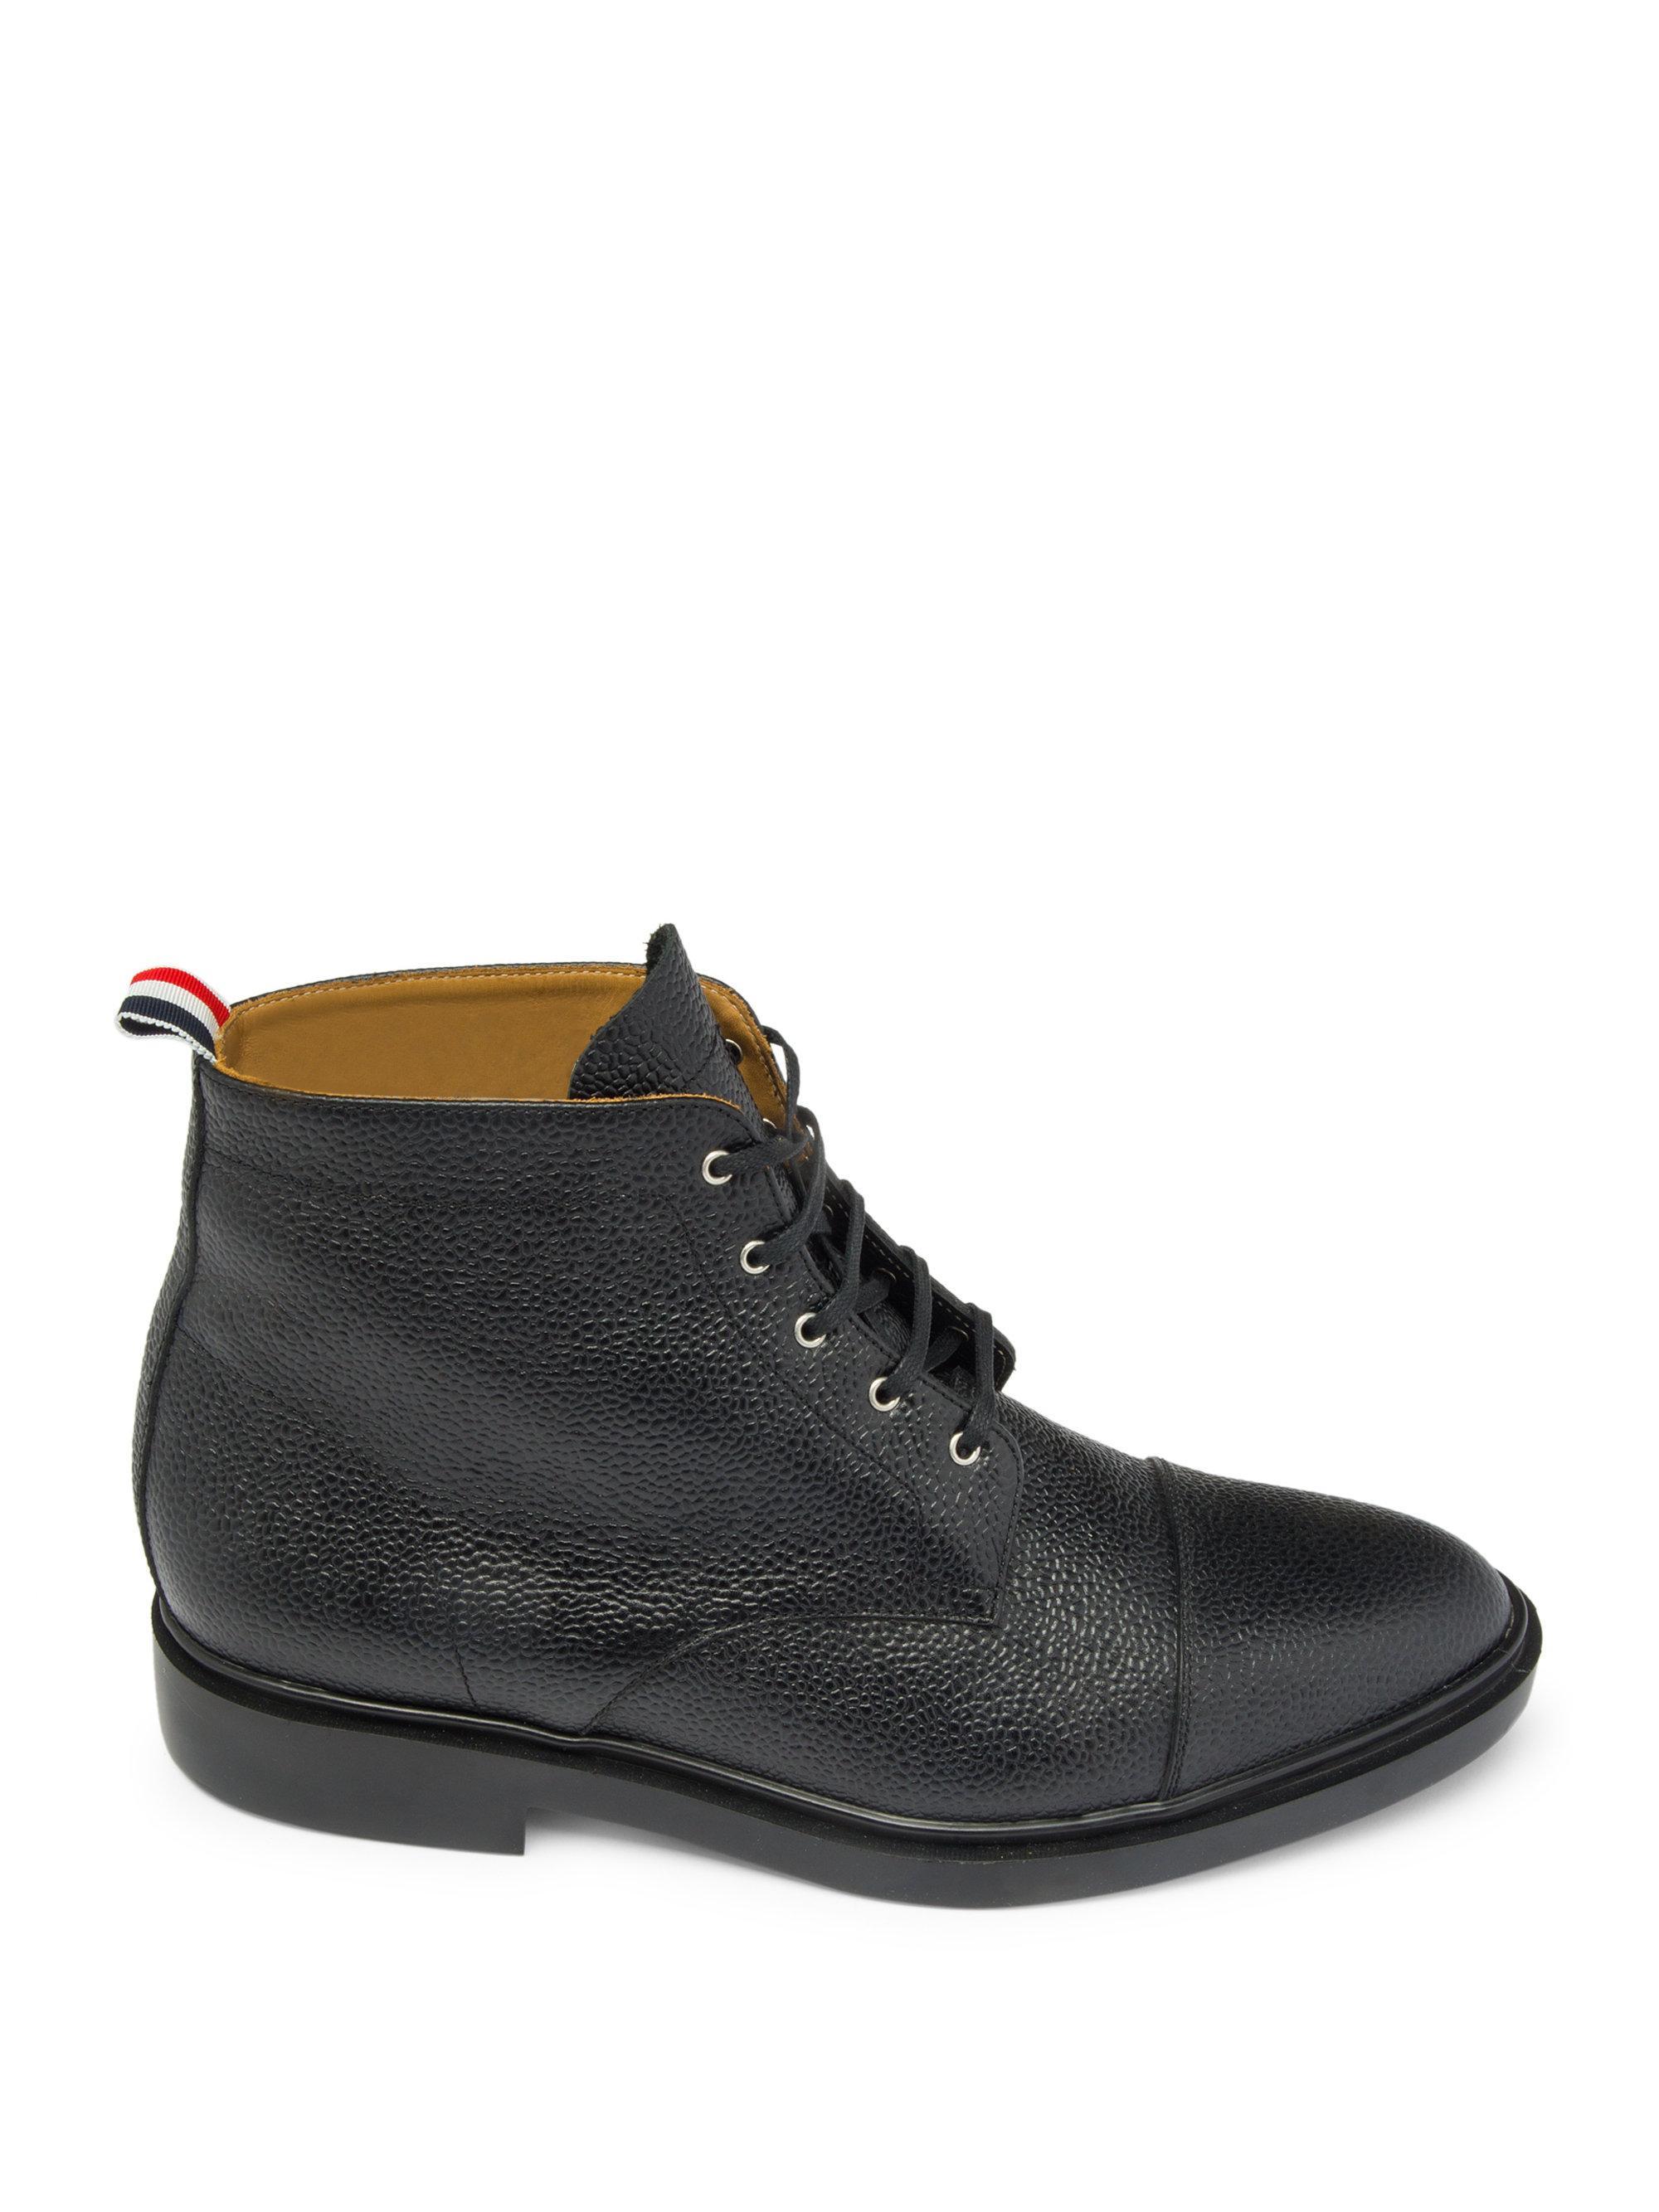 Thom Browne Derby Lace-up Captoe Boots QYOYUKA8Ea